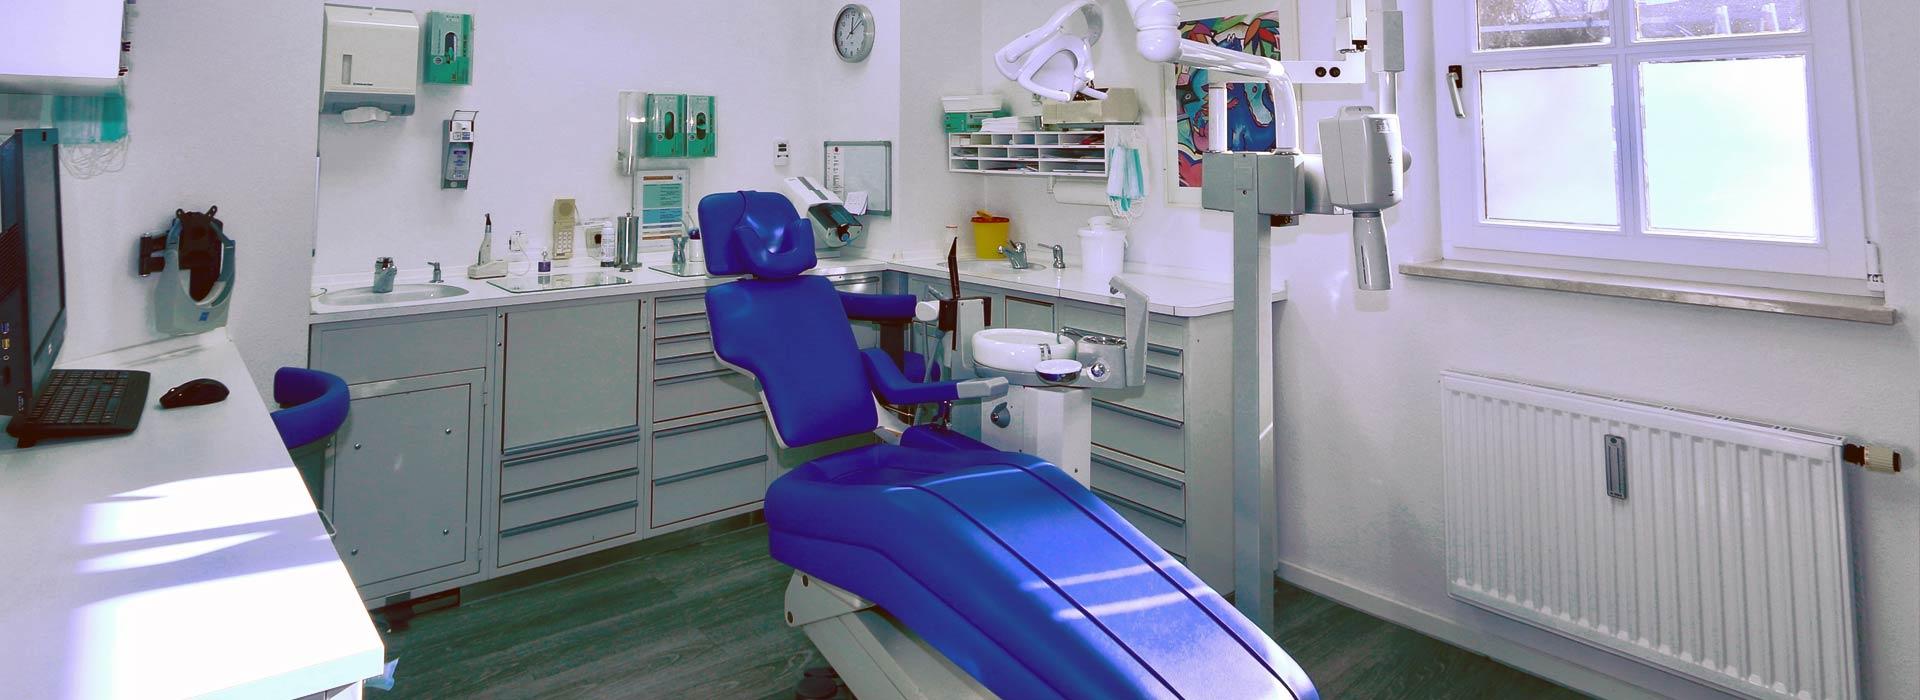 Behandlungszimmer 4 in der Zahnarztpraxis Münsing